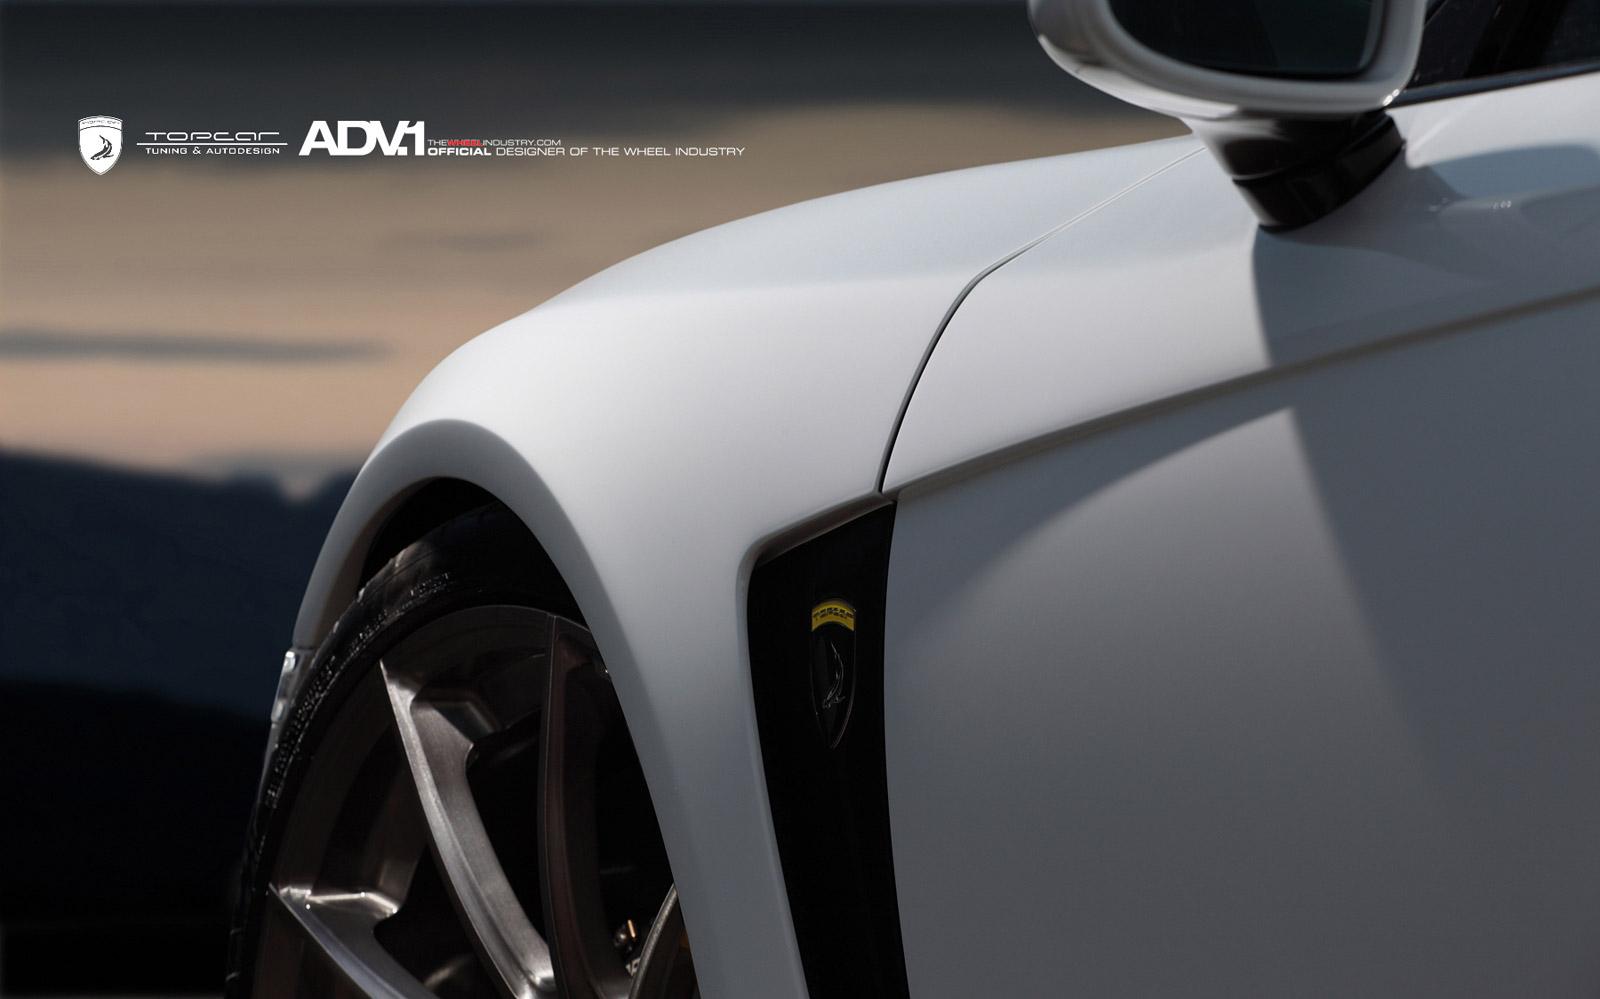 porsche-911-turbo-typ-991-topcar-stinger-gtr-010